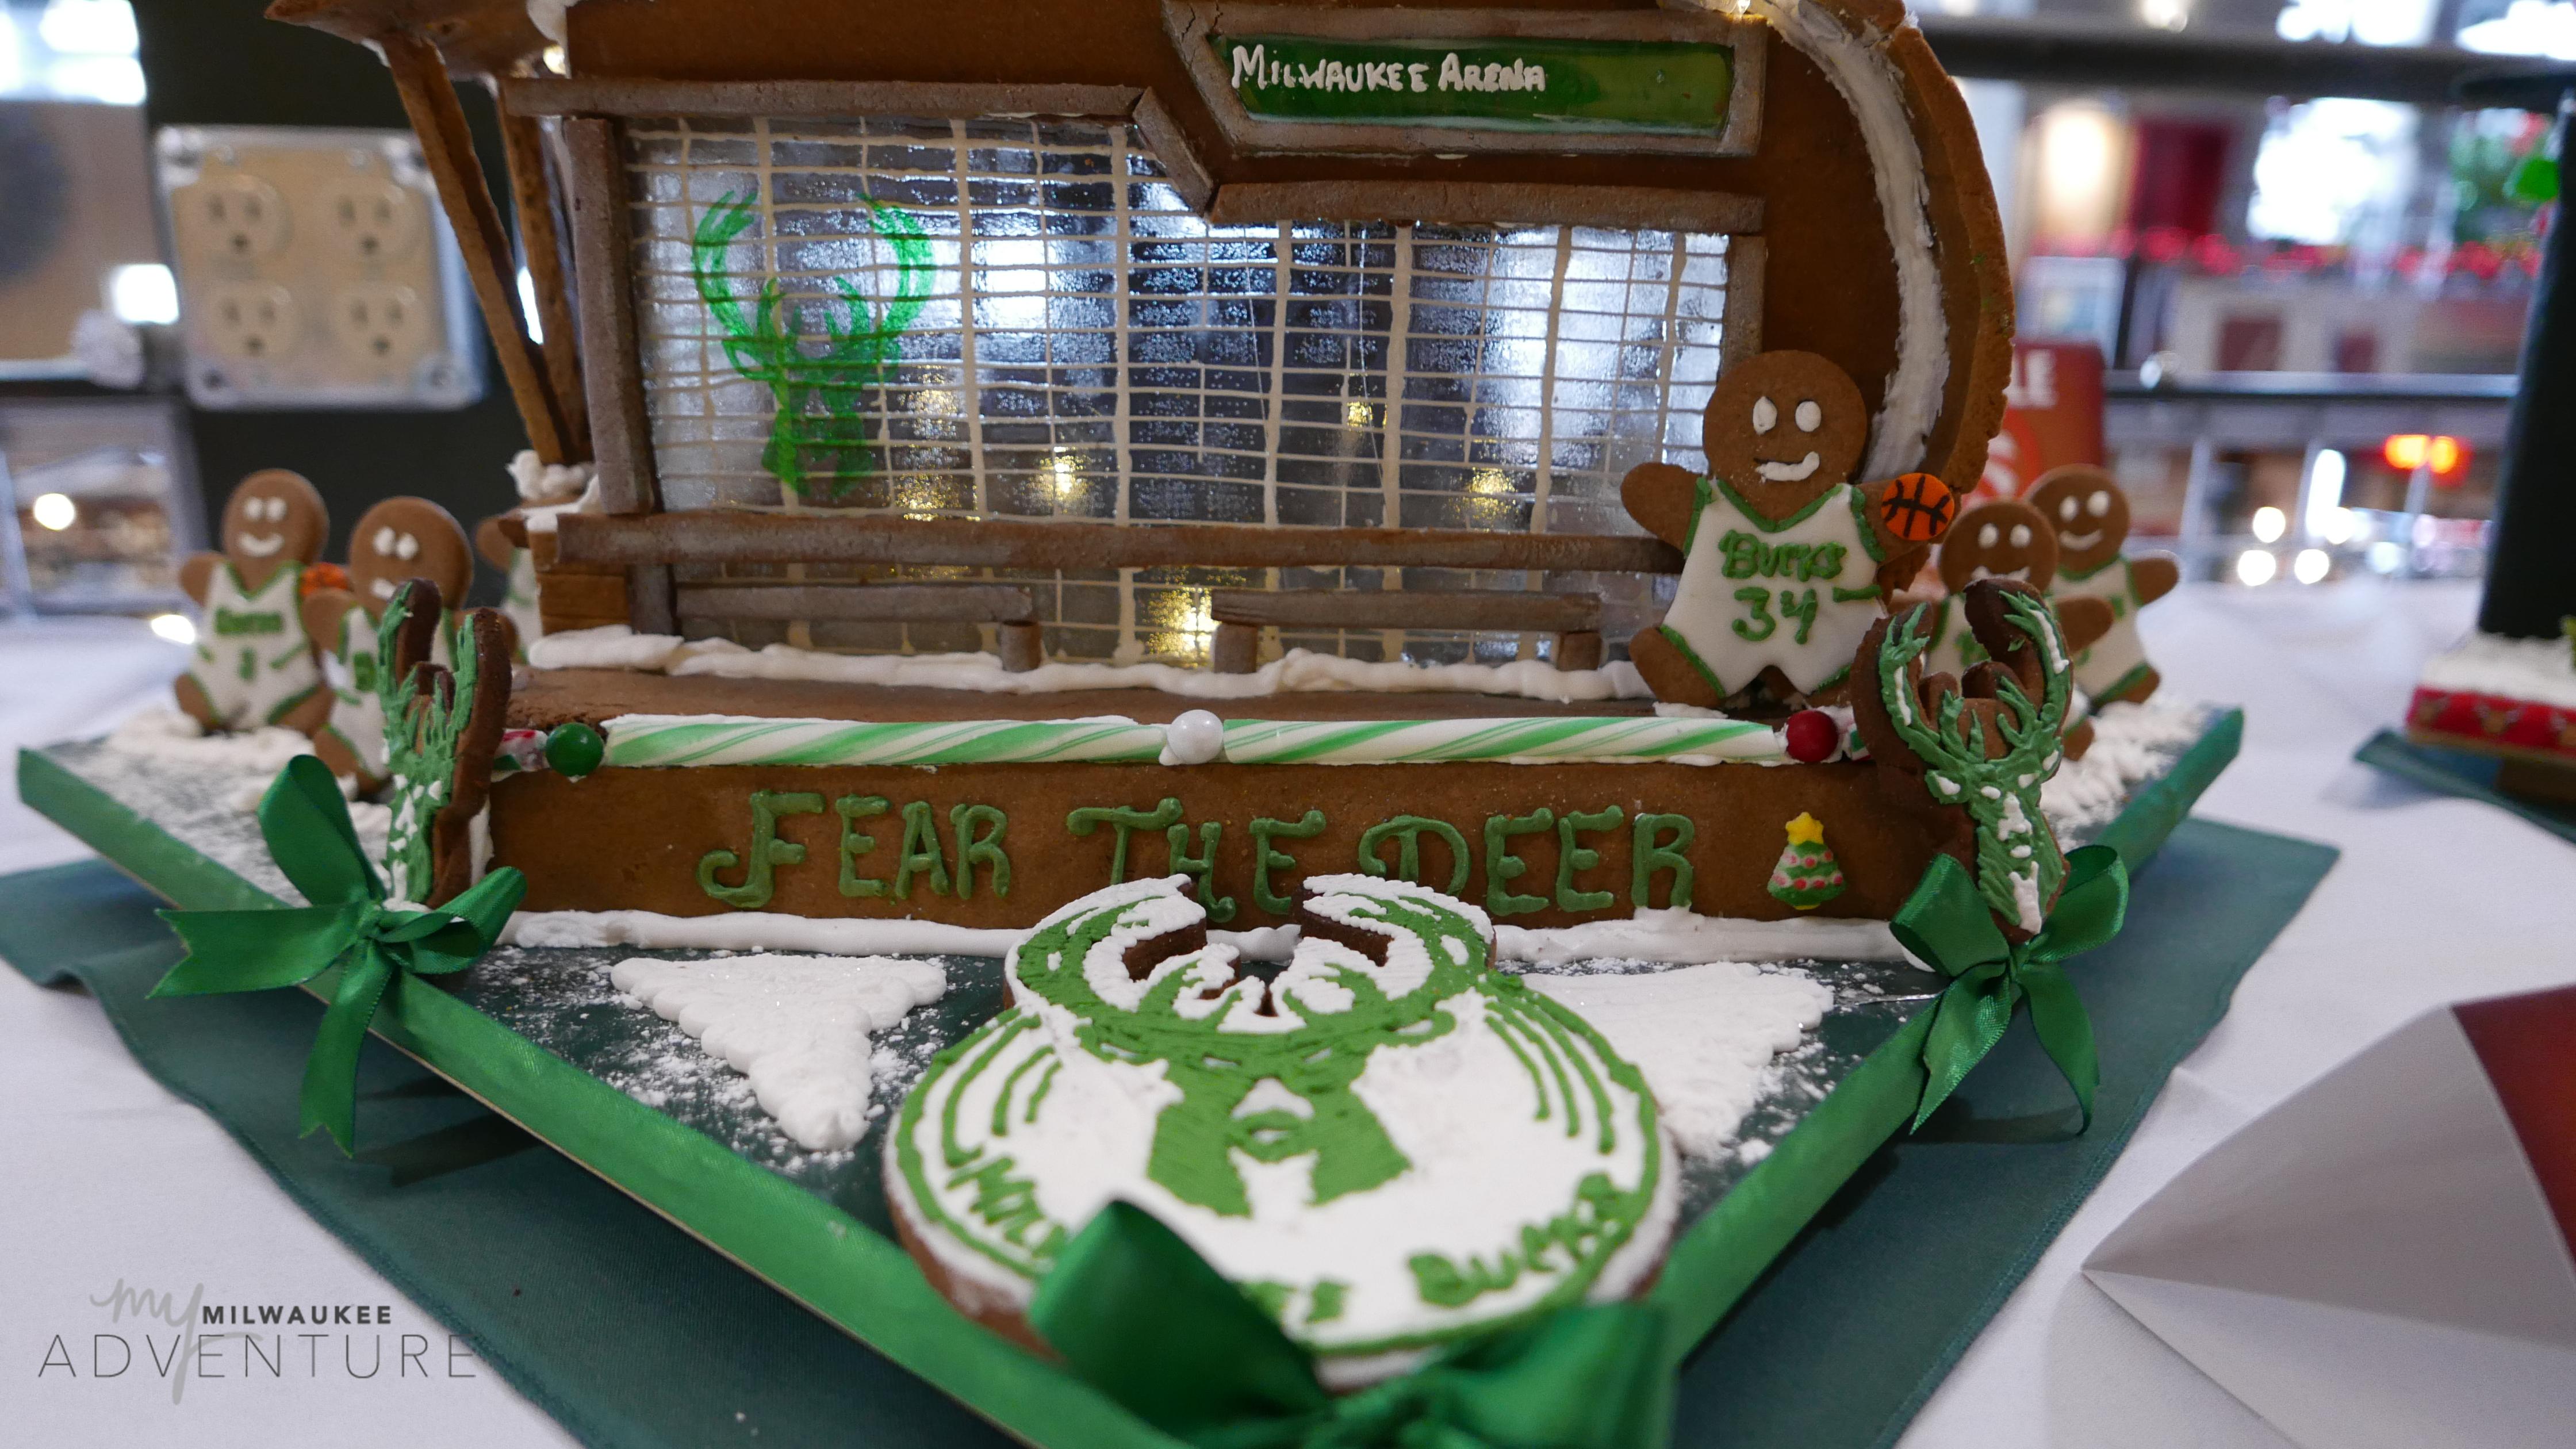 Milwaukee Bucks Arena Gingerbread House